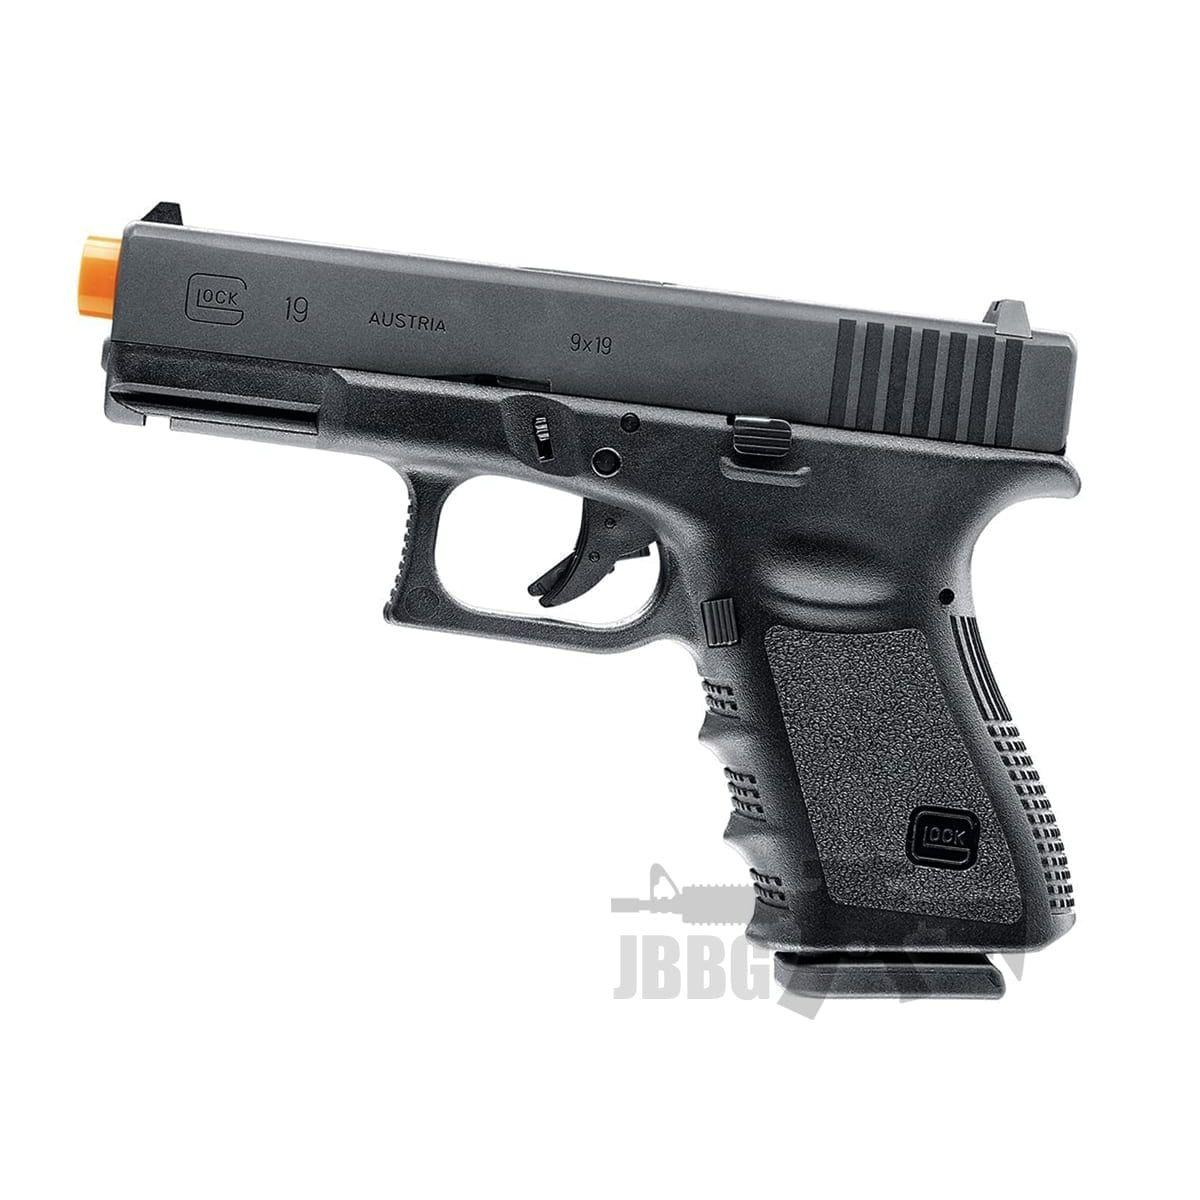 g19 pistol